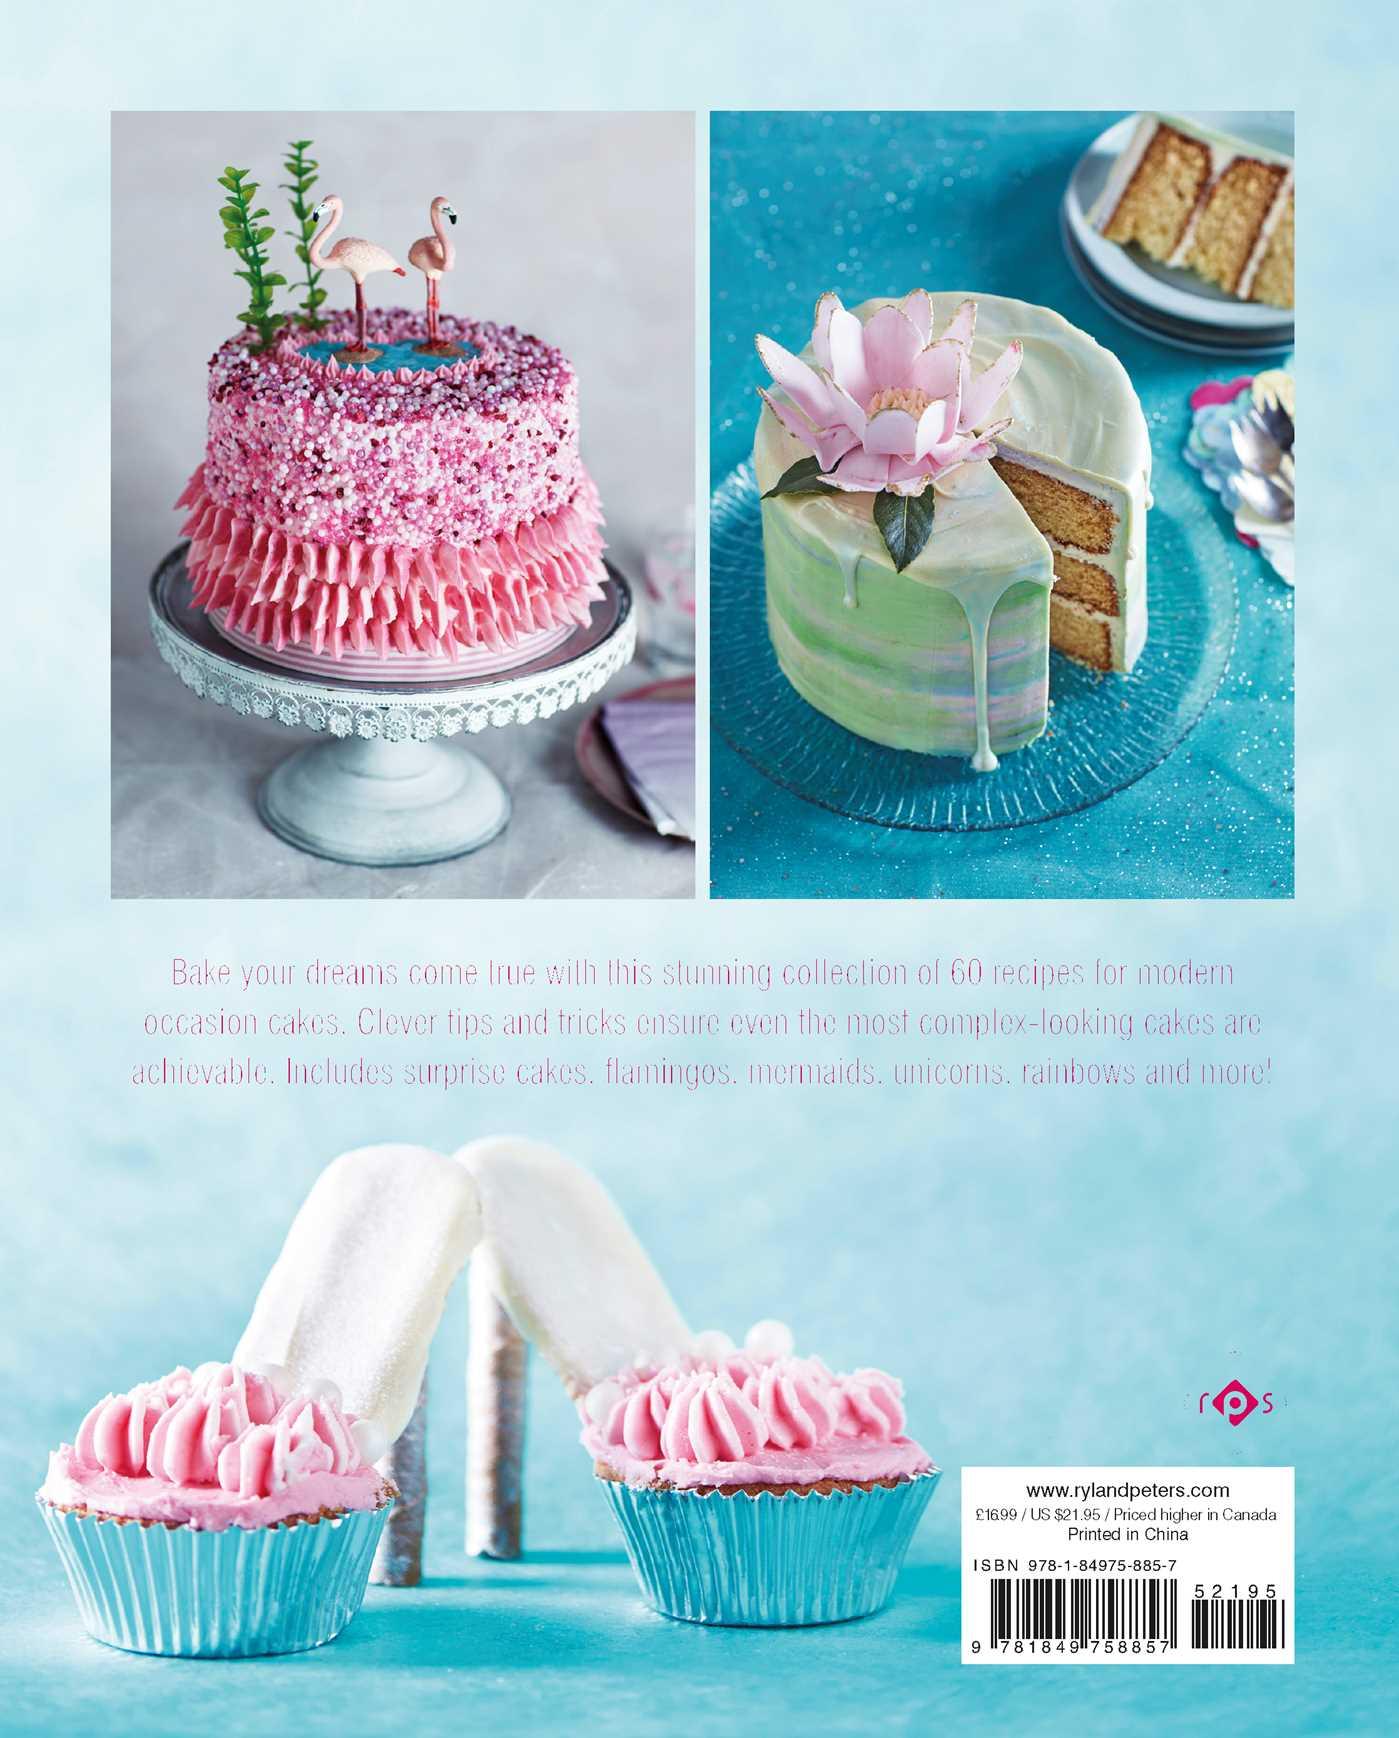 Fantasy cakes 9781849758857 hr back